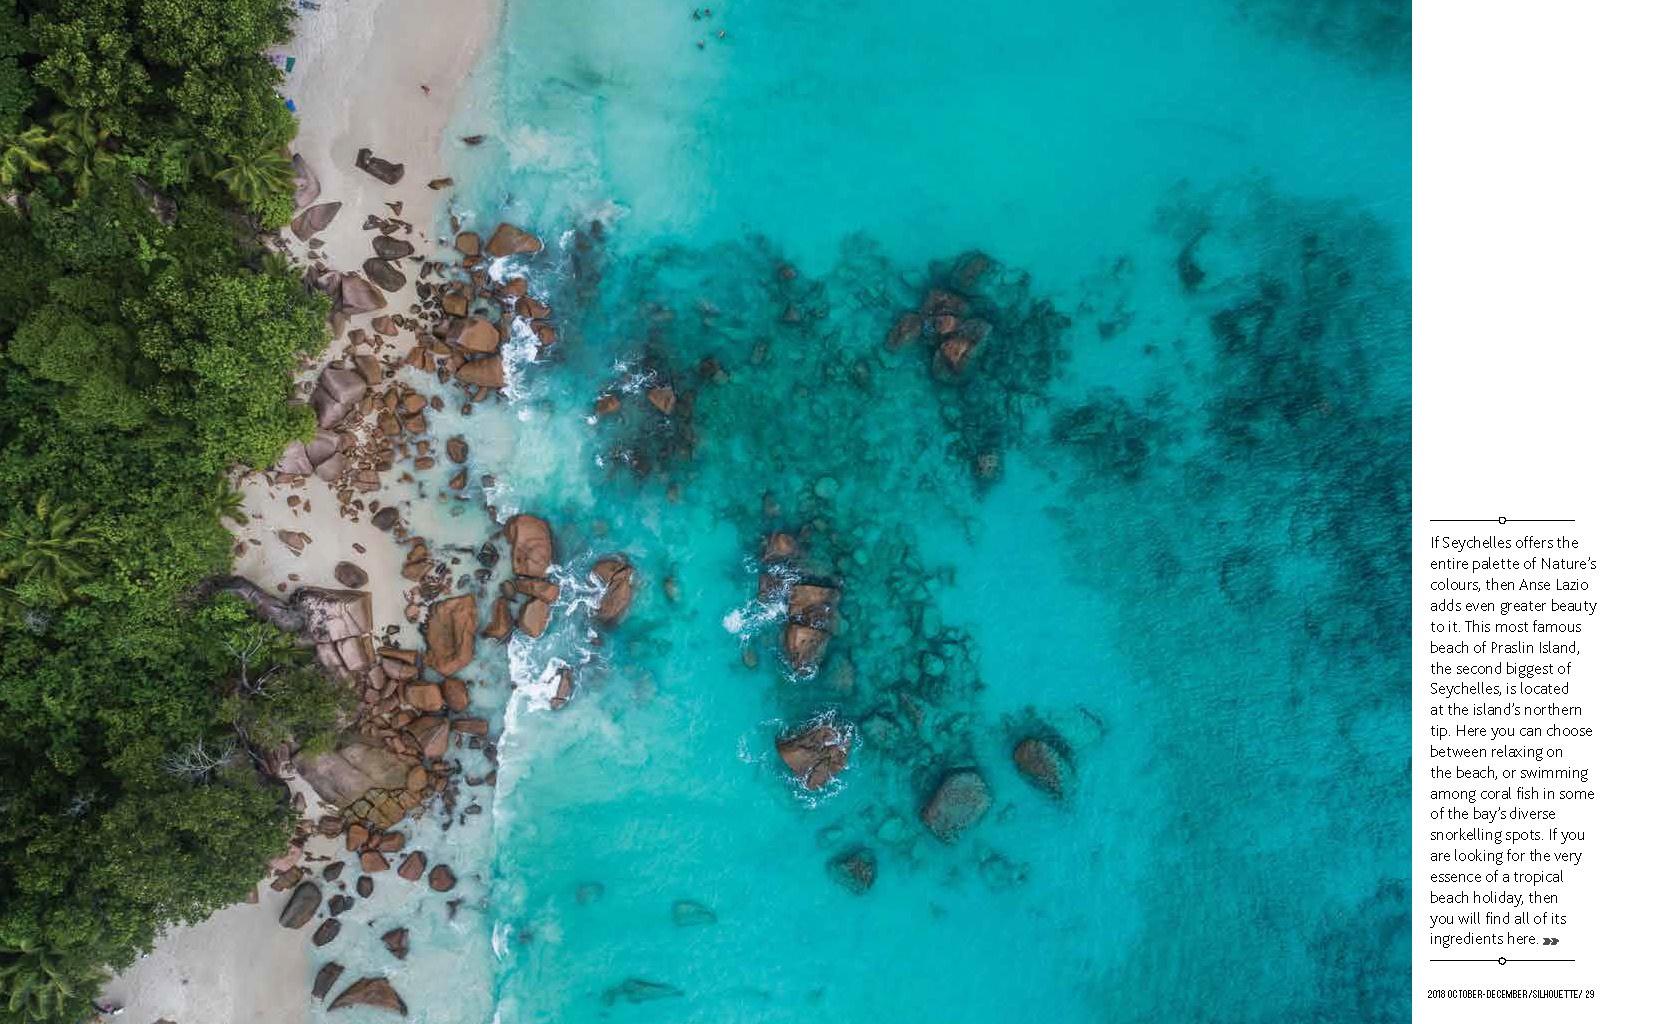 Seychelles From Above Air Seychelles Silhouette inflight magazine drone reportage enrico pescantini blue planet anse lazio